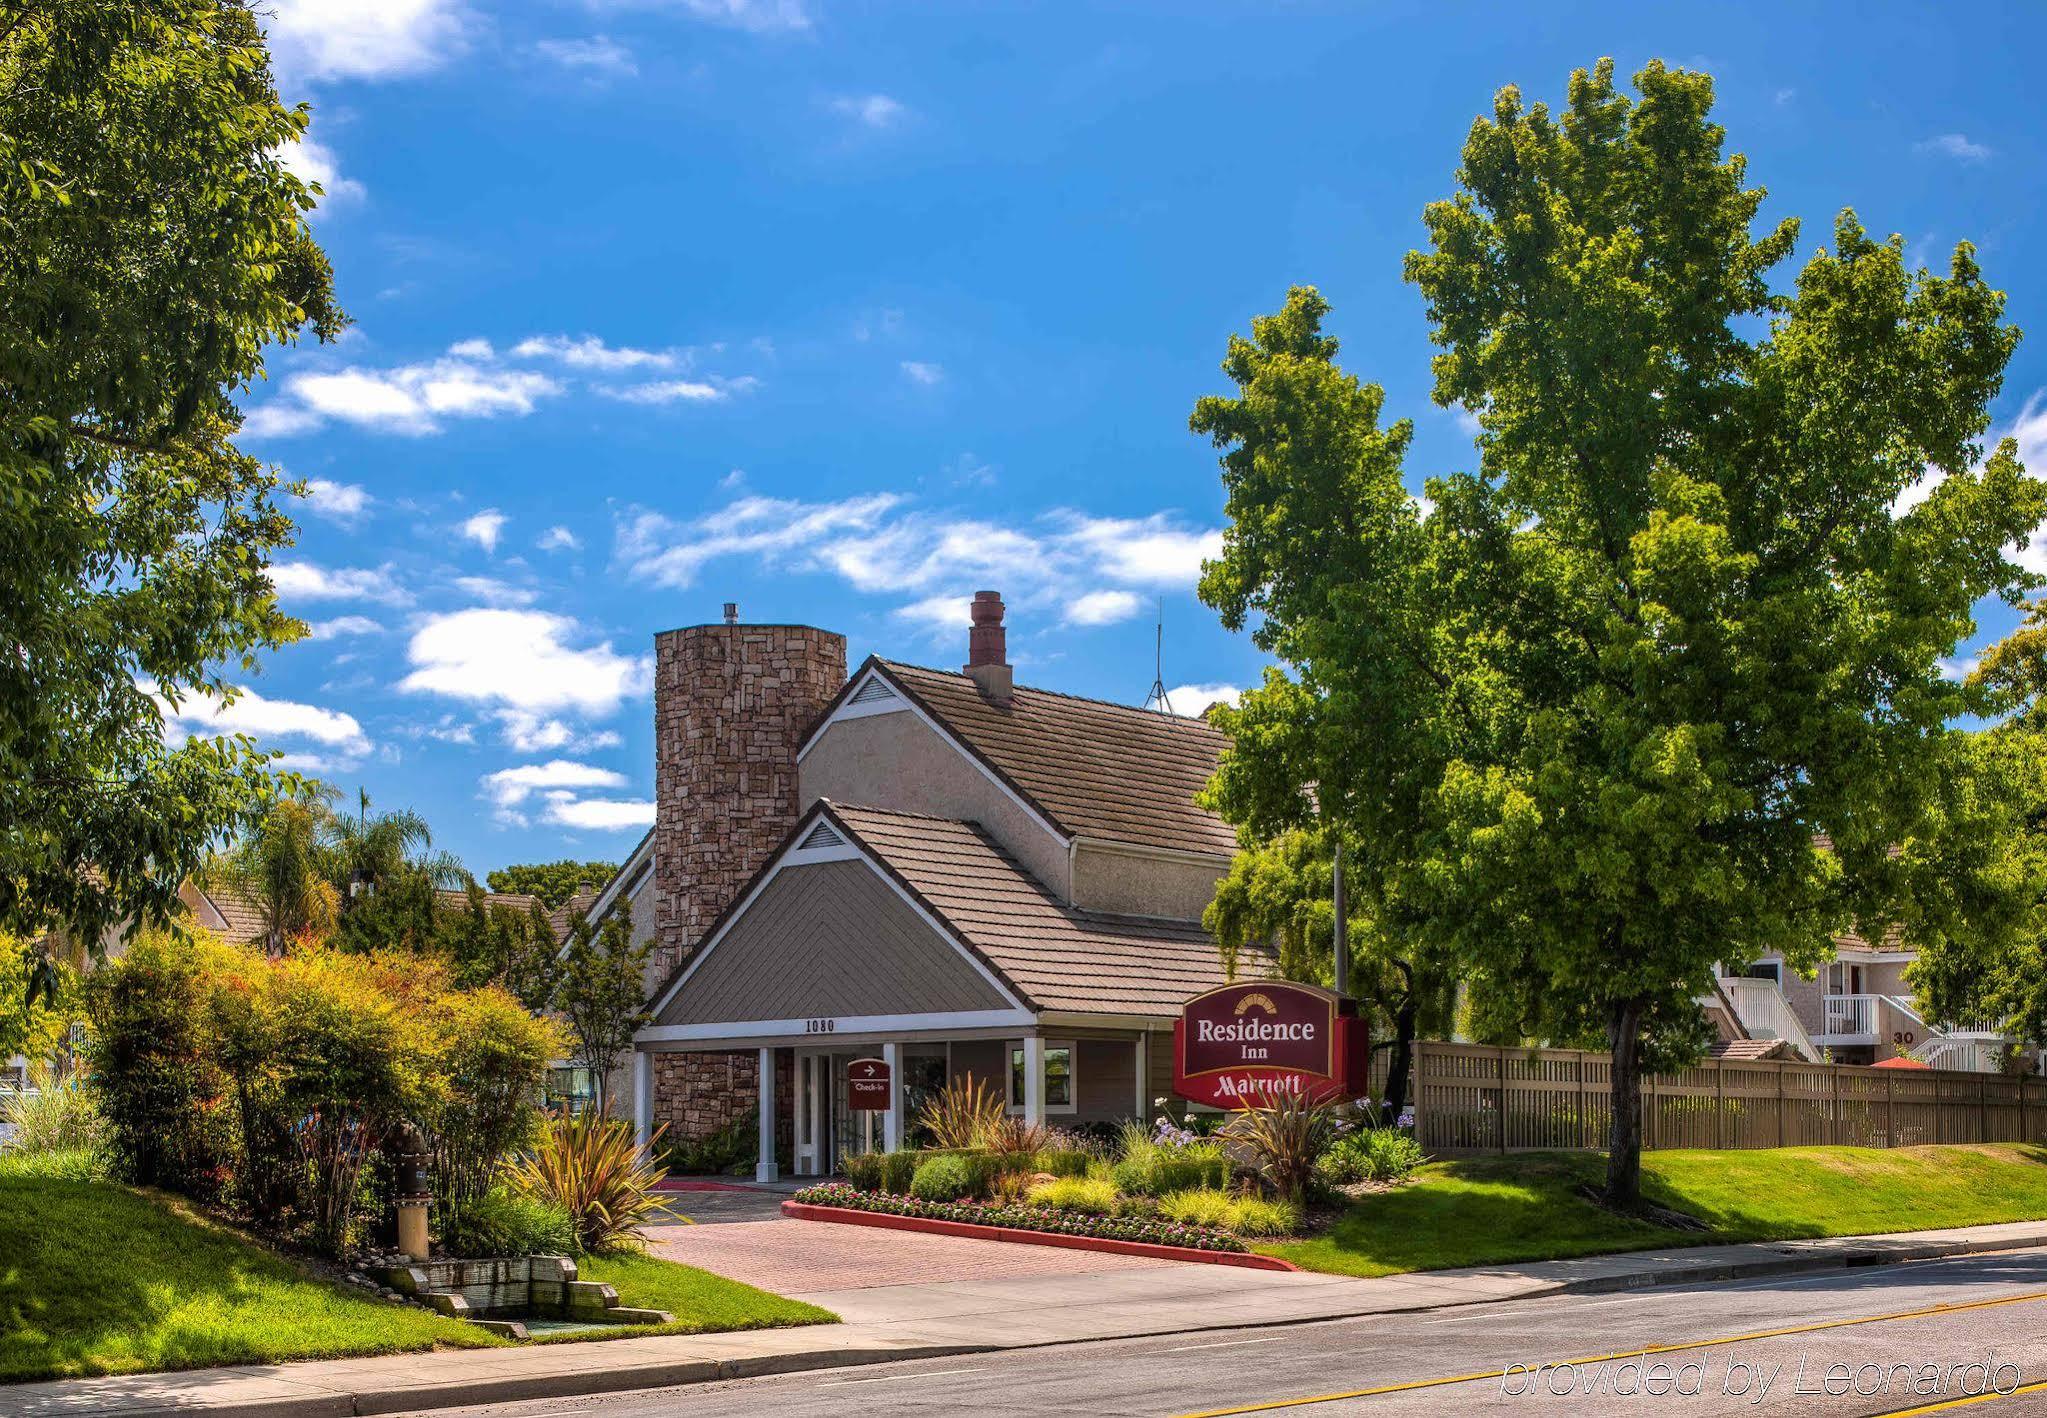 Residence Inn by Marriott Silicon Valley Sunnyvale II